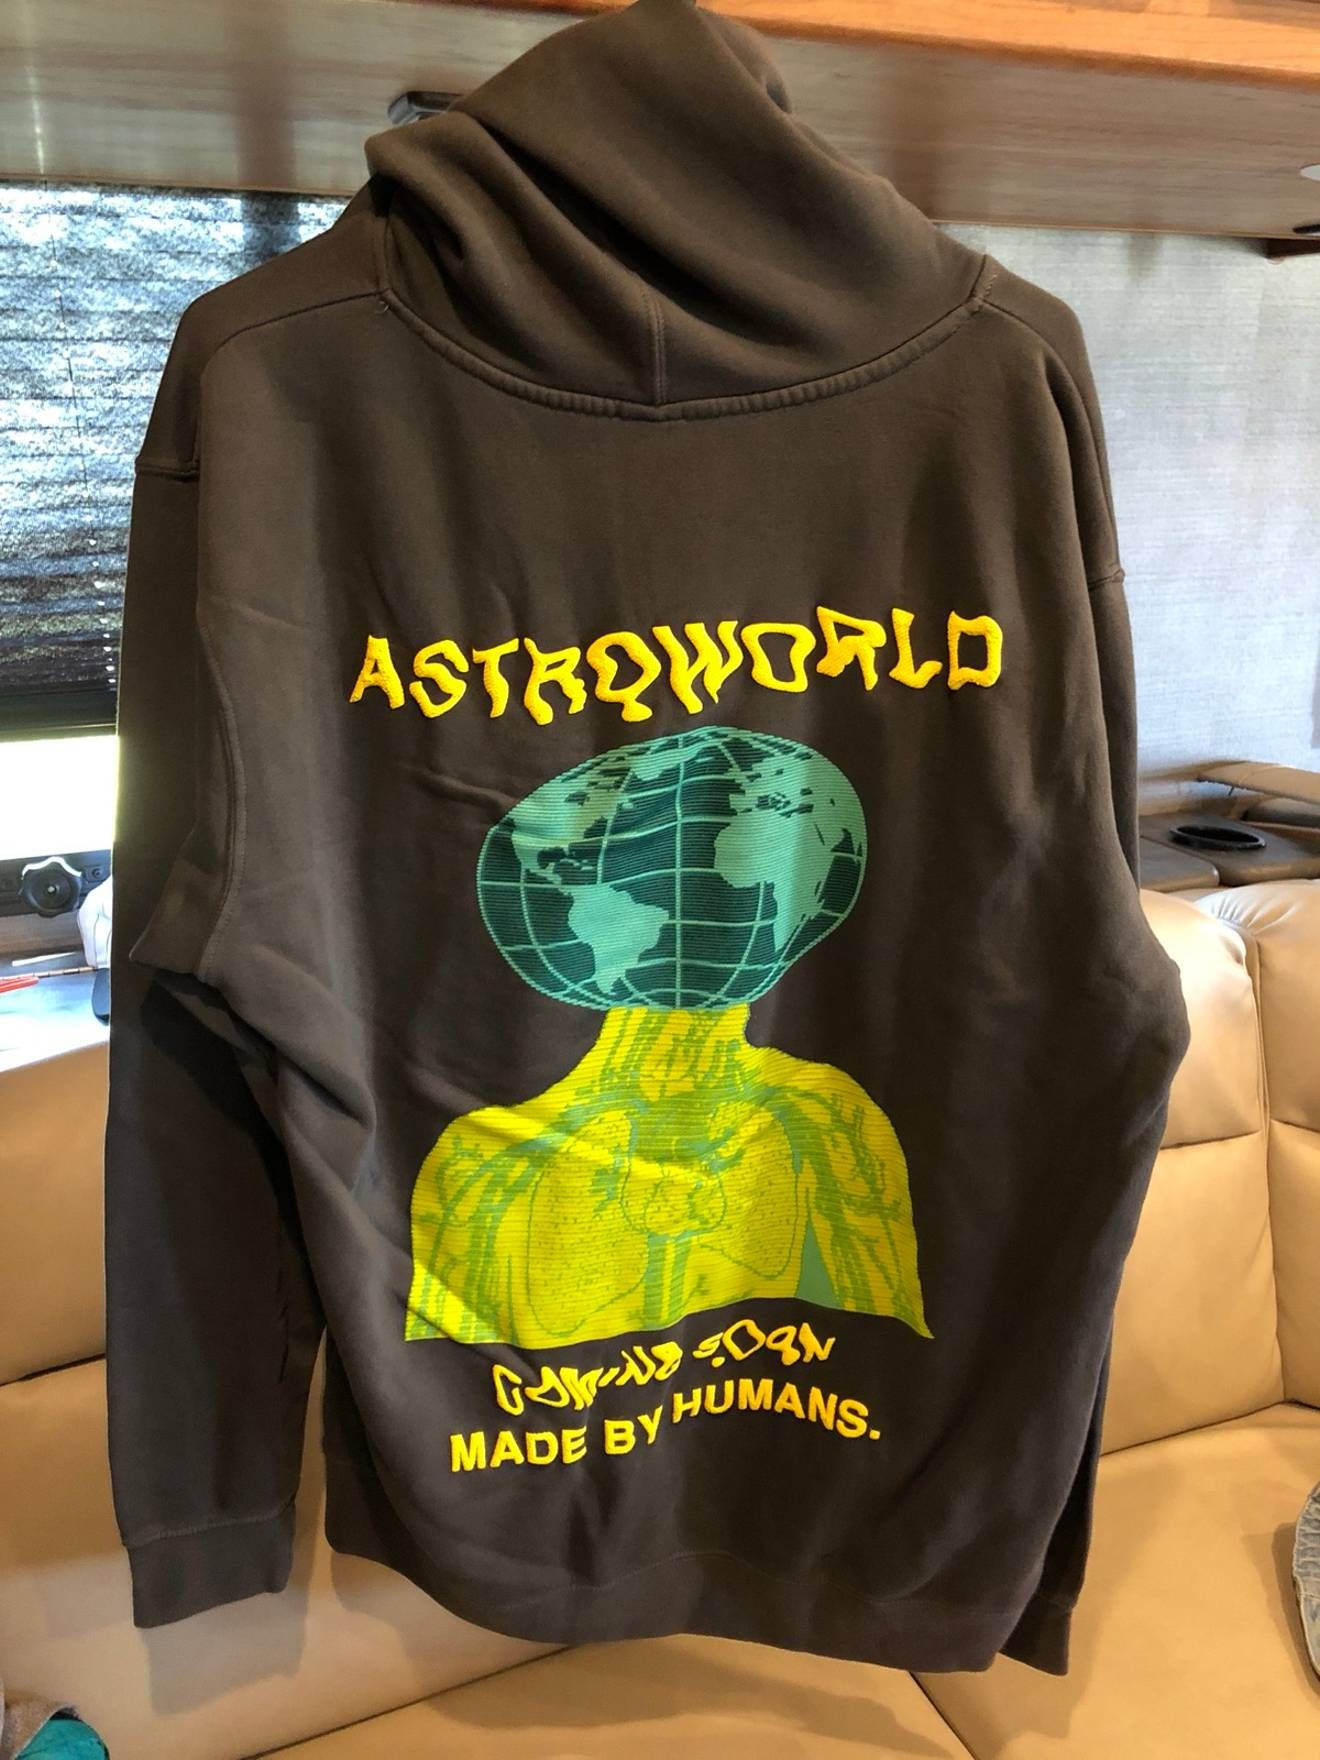 a0e5a86282f4 Travis Scott Travis Scott Cactus Jack Astroworld Hoodie Size US M / EU 48-50  / 2